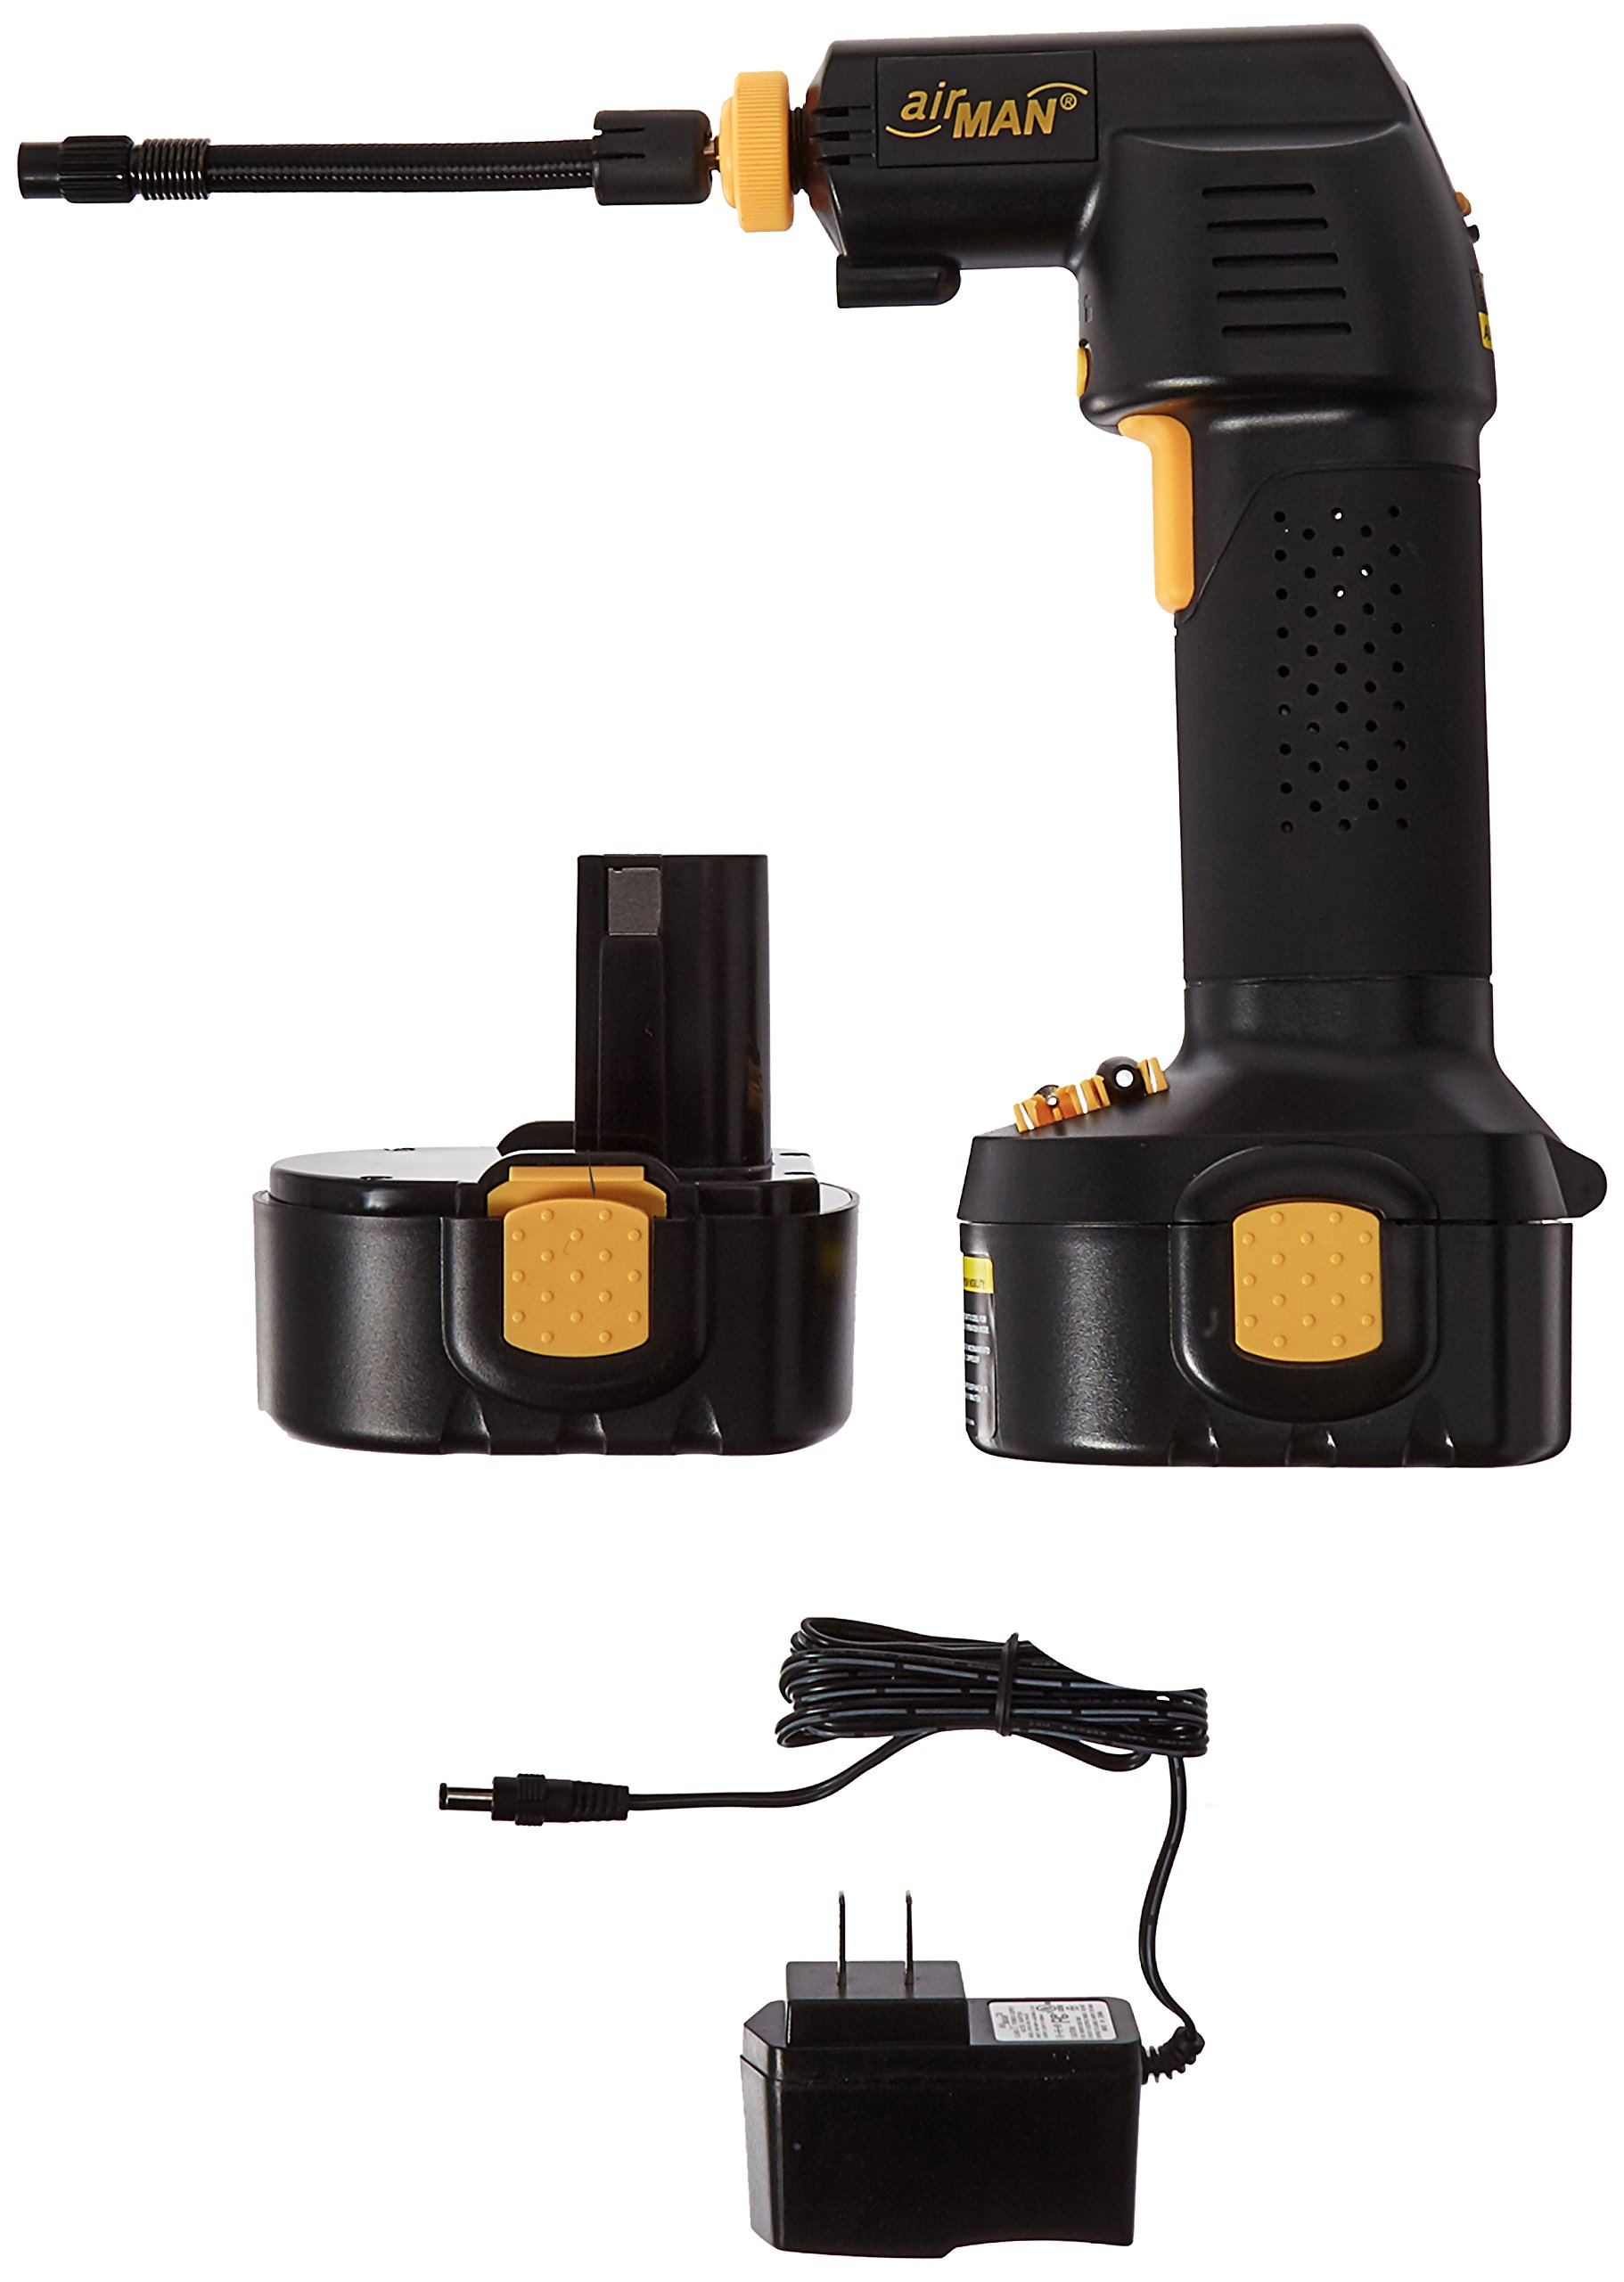 ActiveTool Airman Cordless Multi-Purpose Air Pump